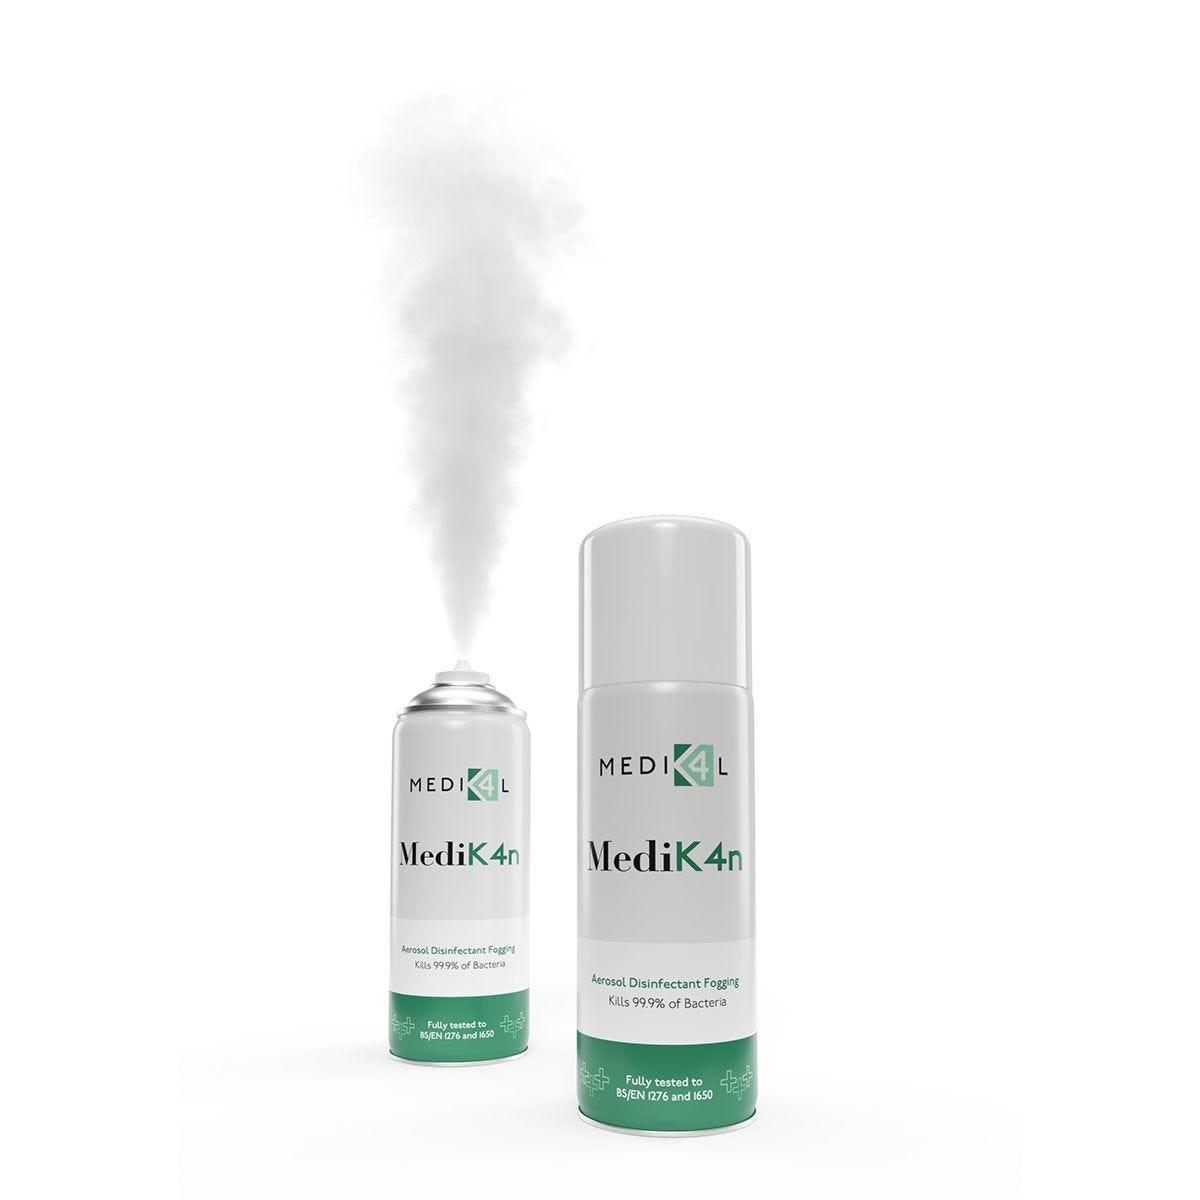 Medik4n Aerosol Disinfectant Fogger Can - 150ml